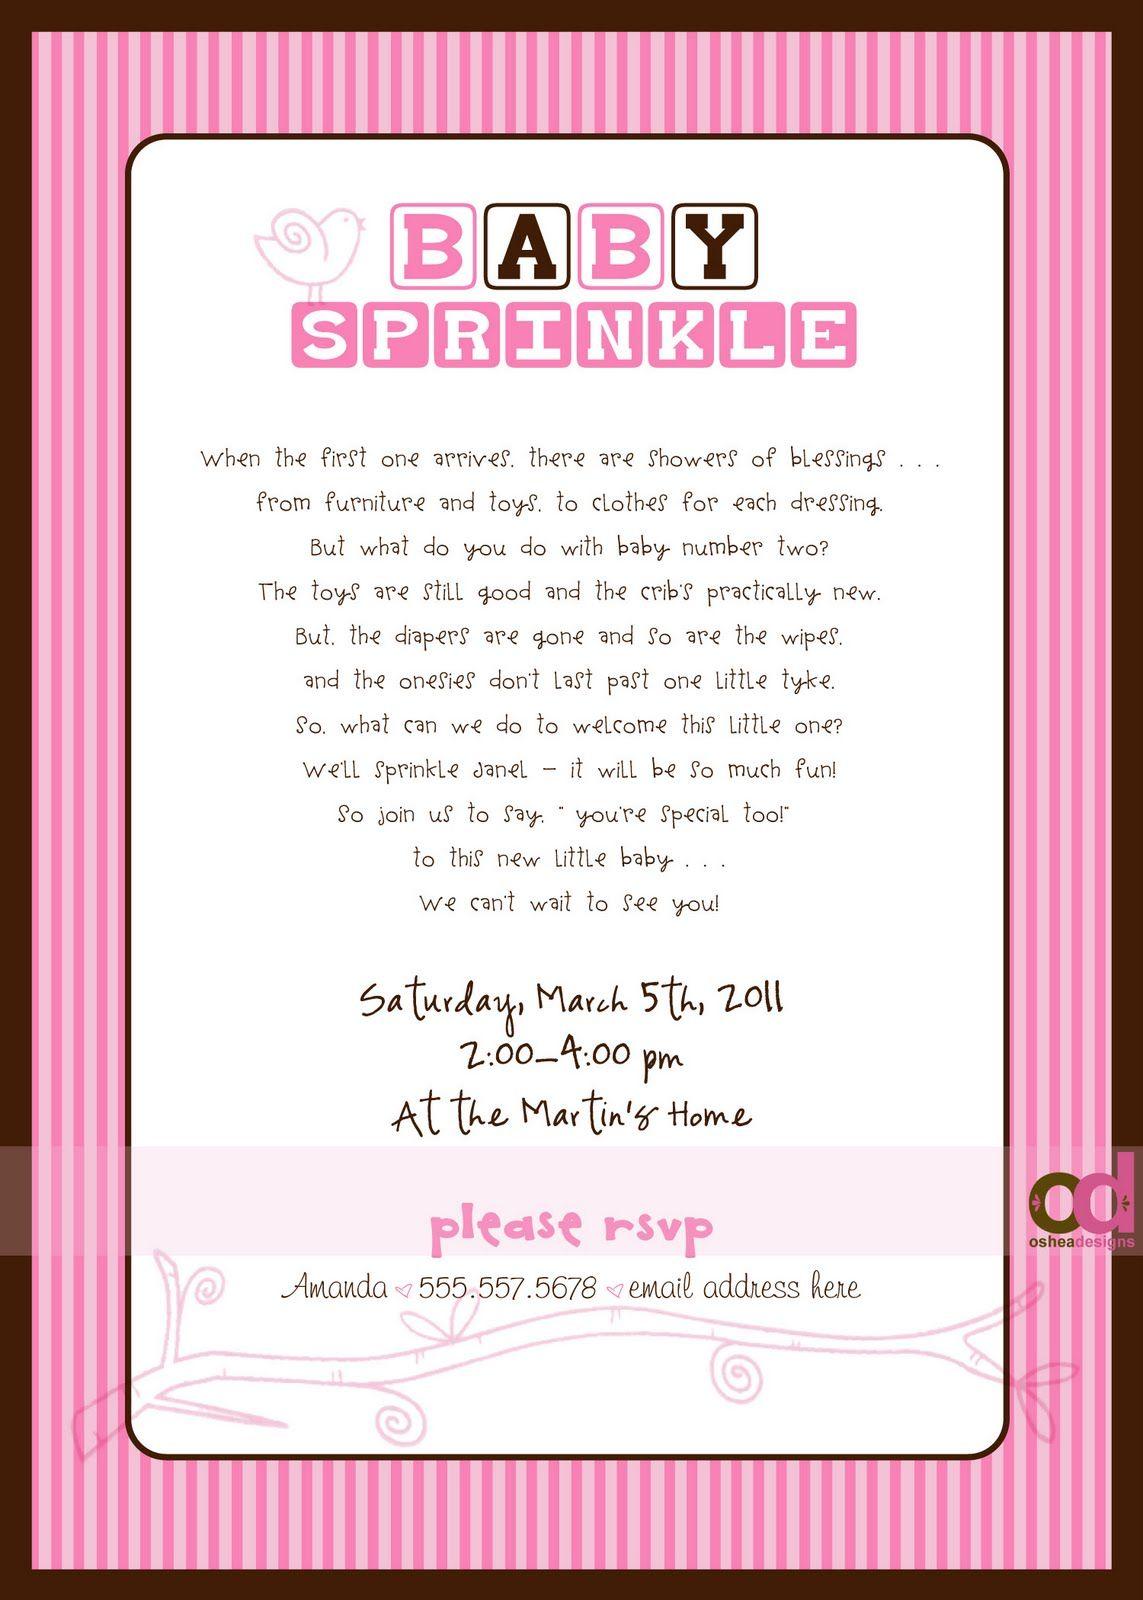 Osheadesigns Com Baby Sprinkle Invitations Baby Girl Sprinkle Invitations Sprinkle Baby Shower